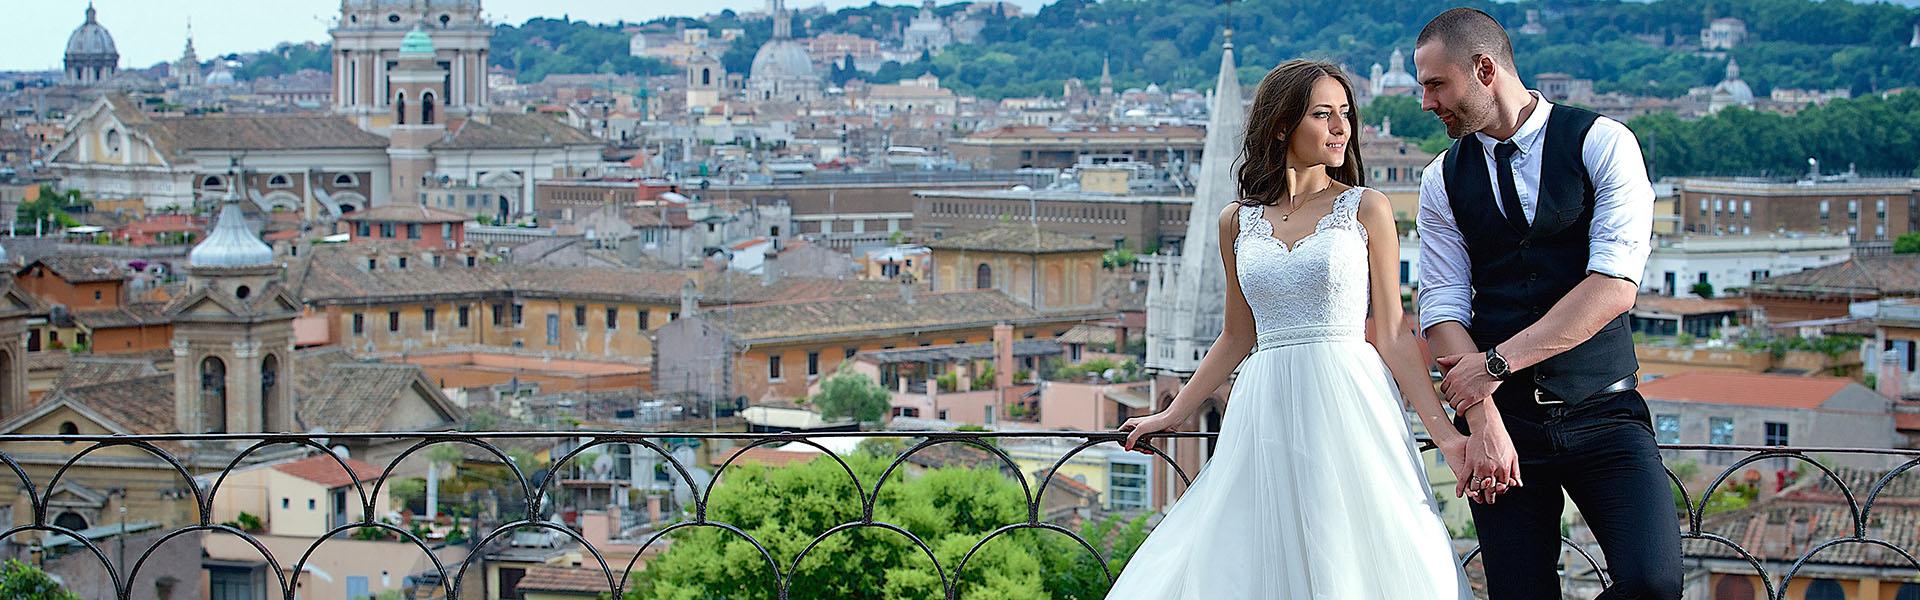 свадебное путешествие proj-zv (5)